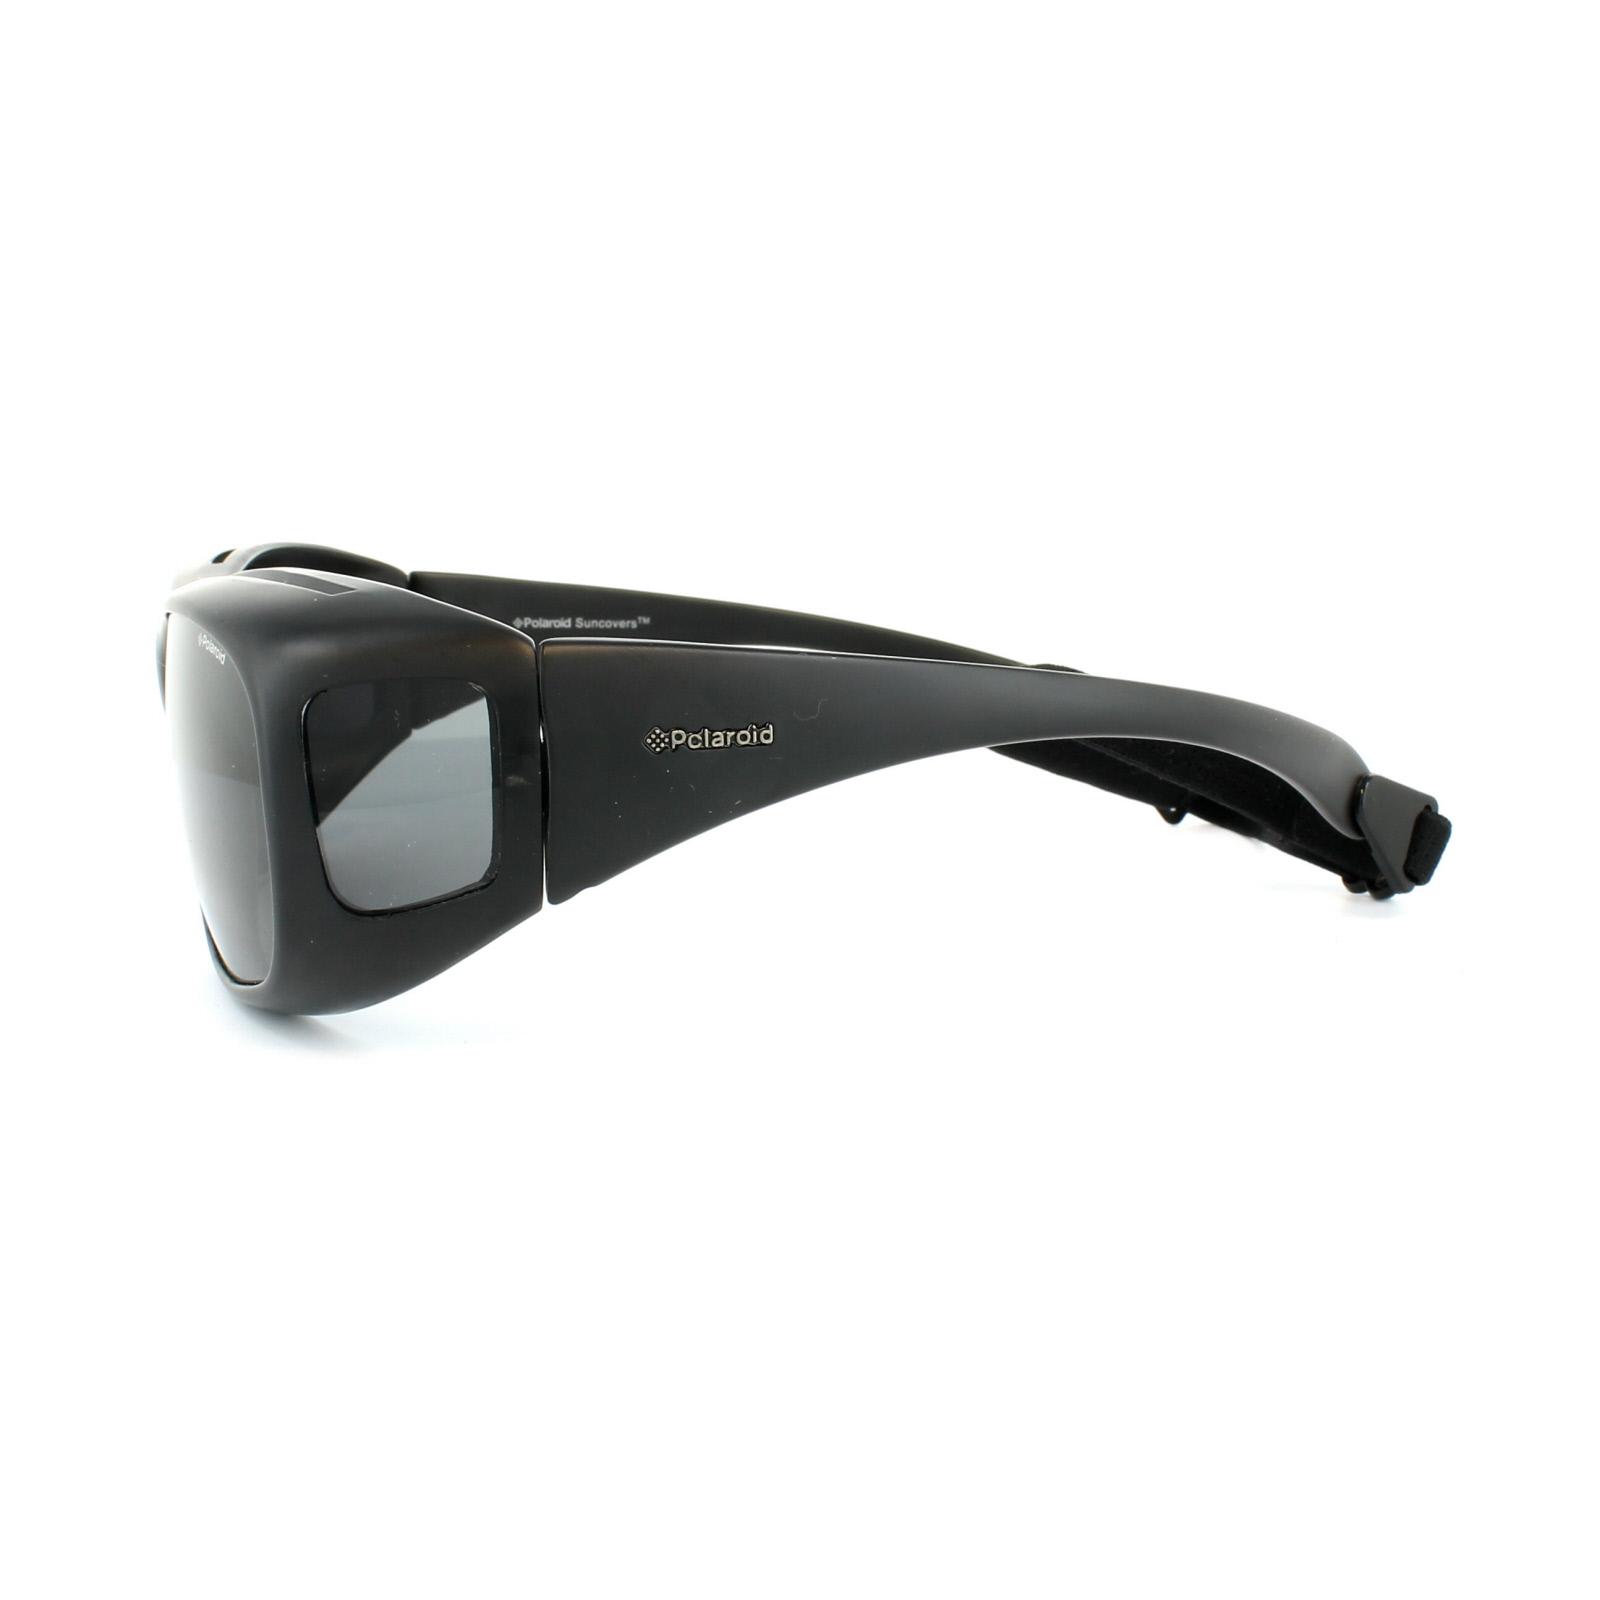 Polaroid 08535 Sunglasses Y2 Suncovers Fitover Black Grey KIH Crwq1Cpnta